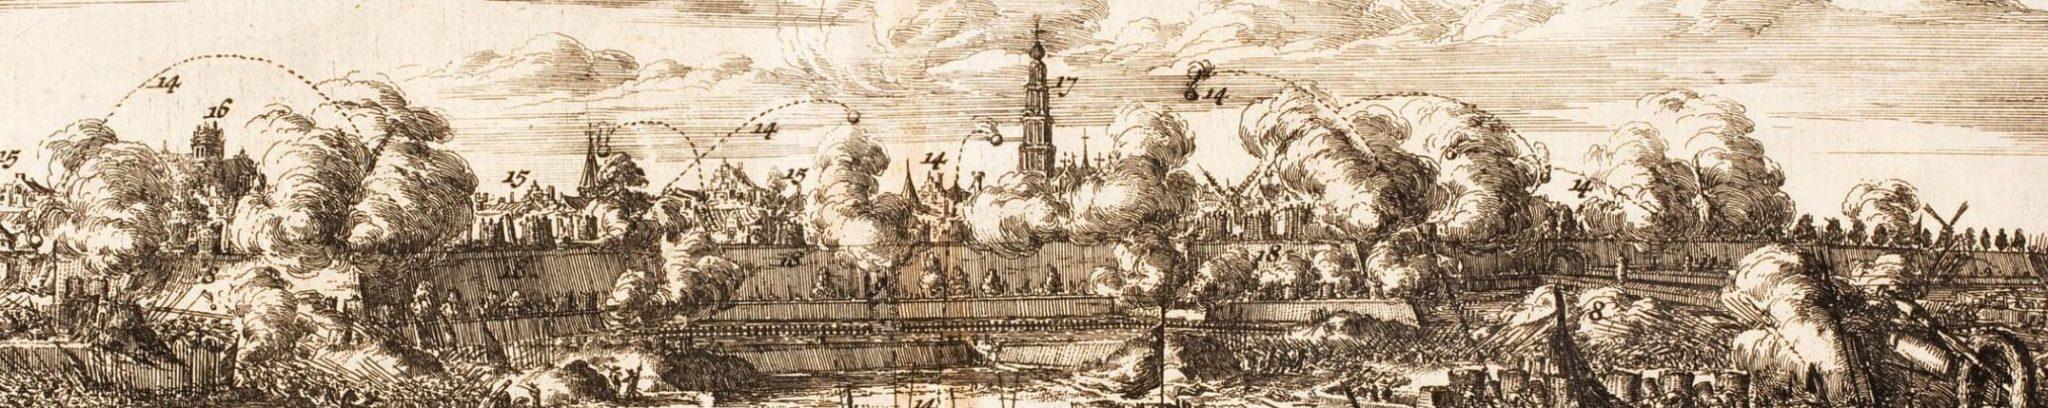 Groningen - Belagerung - Wikipedia